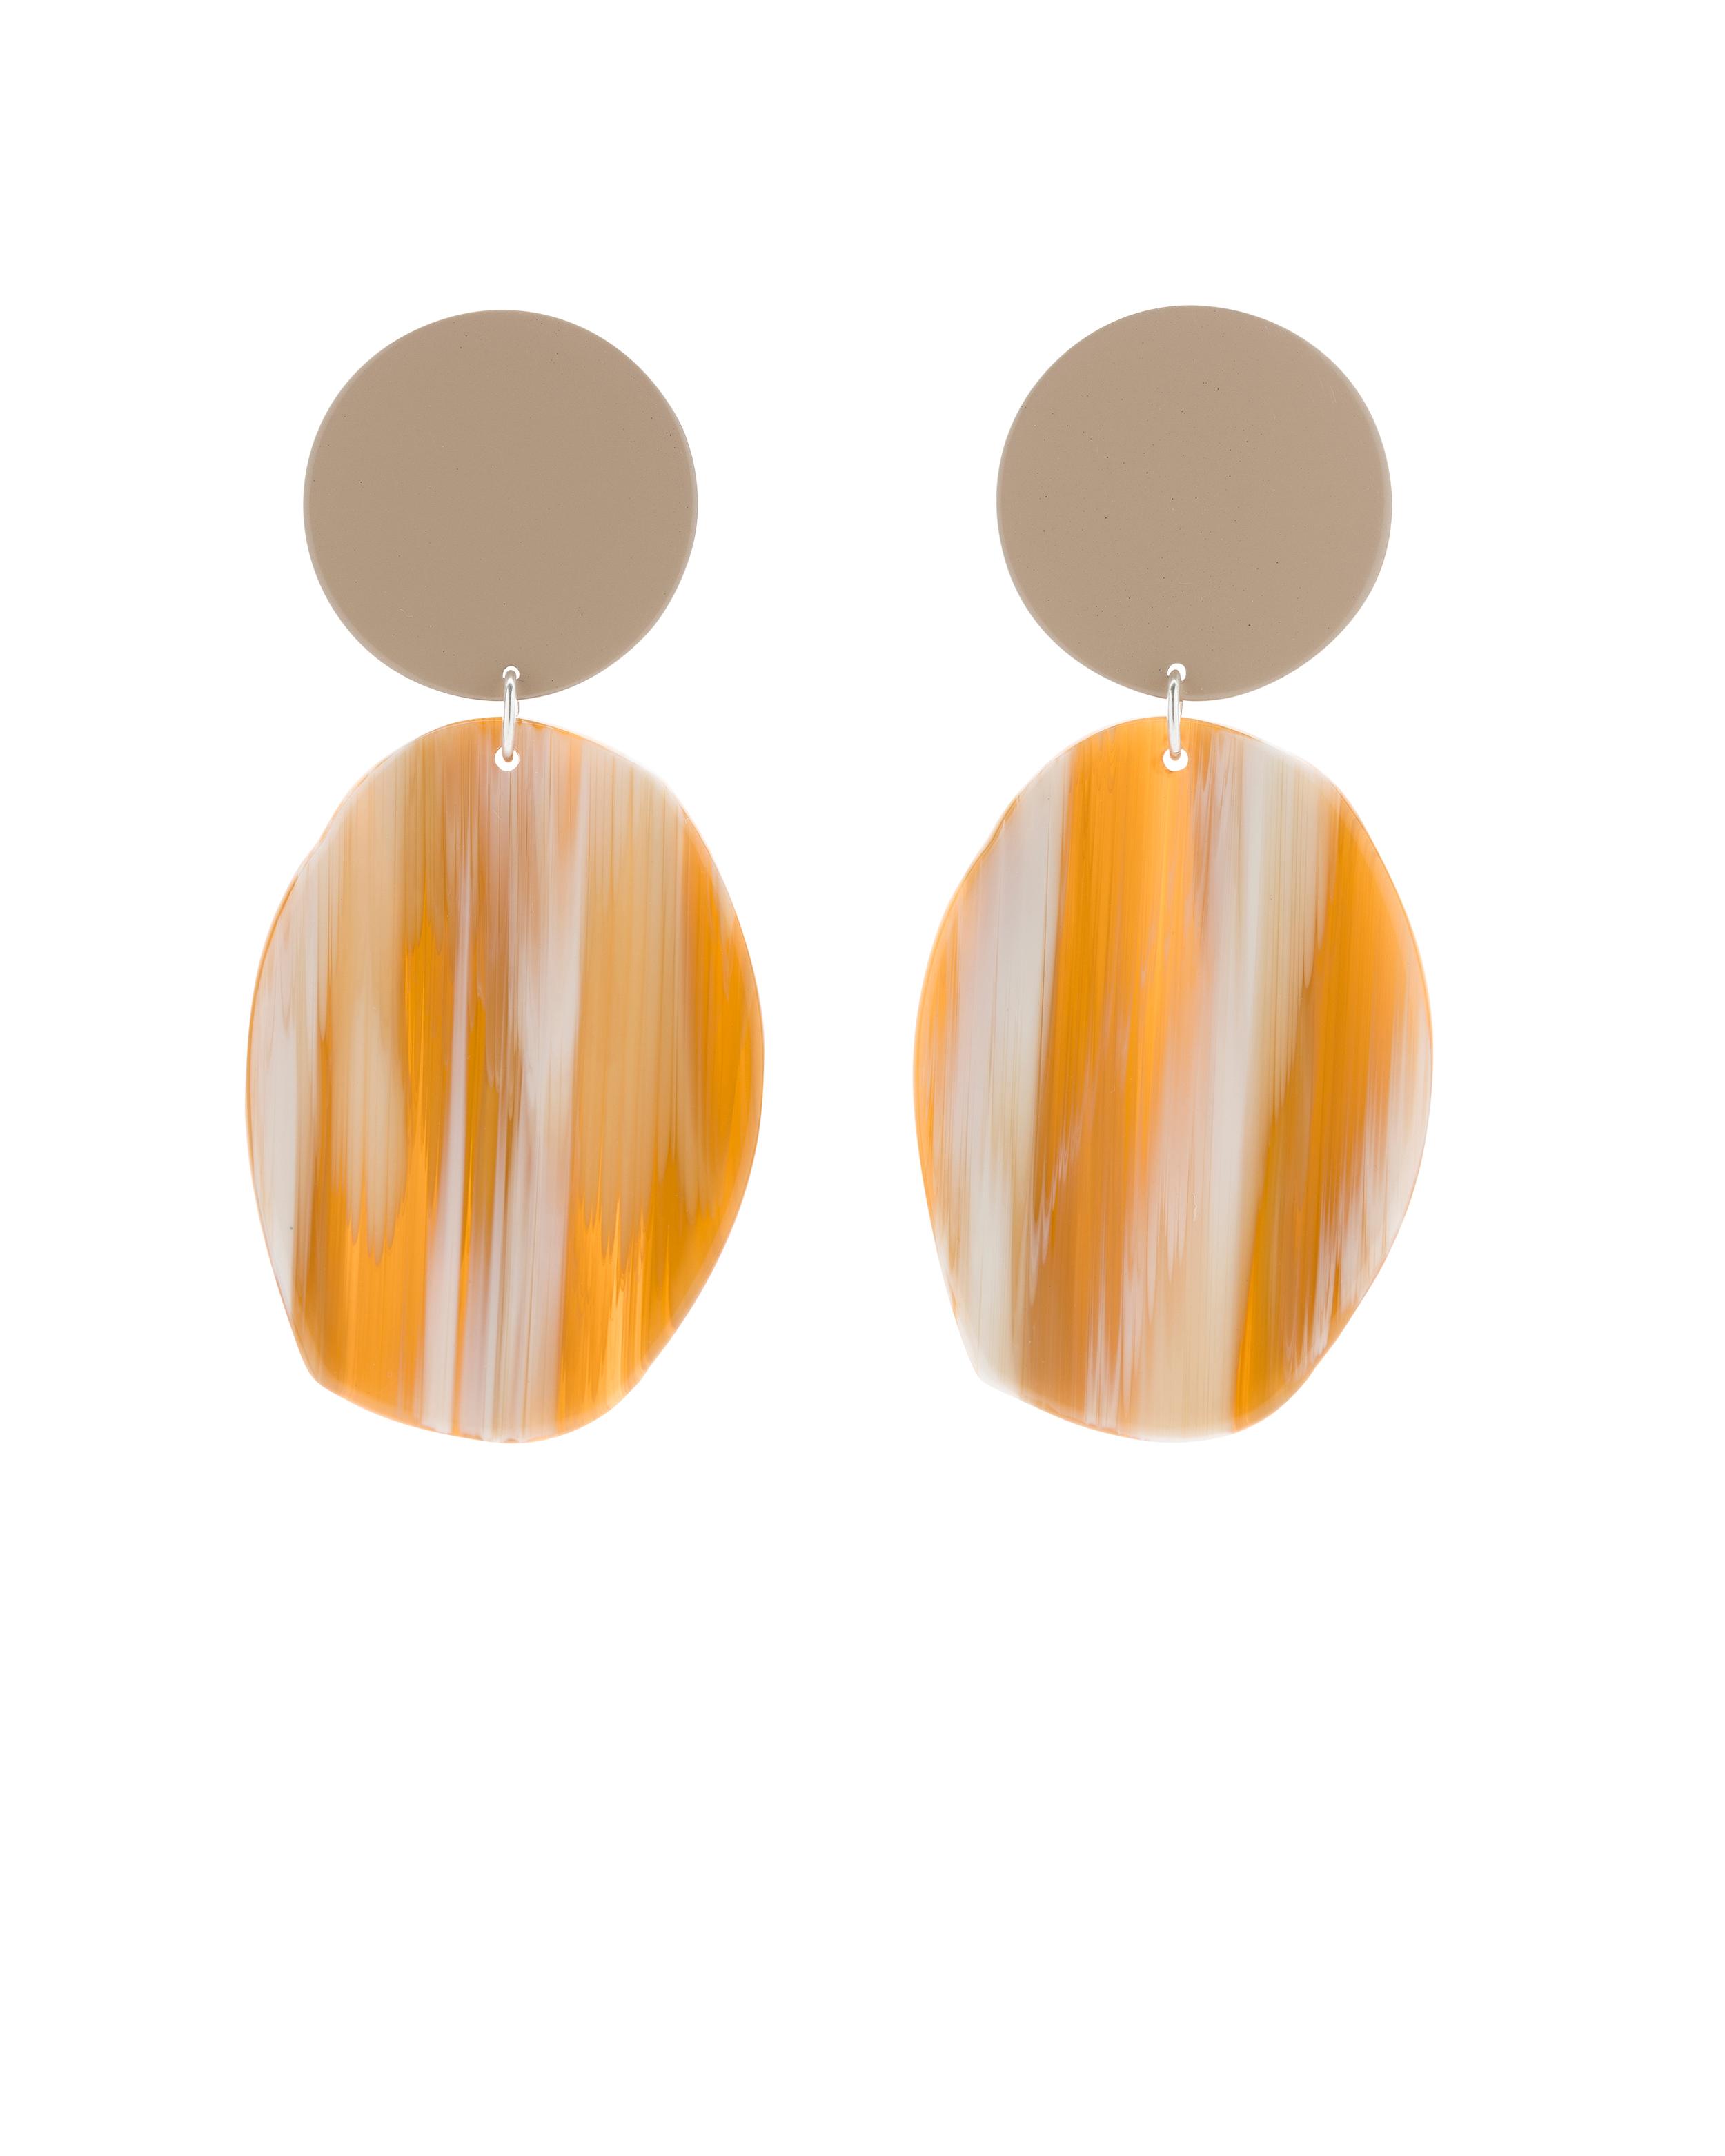 The  Geology Earrings in Tan